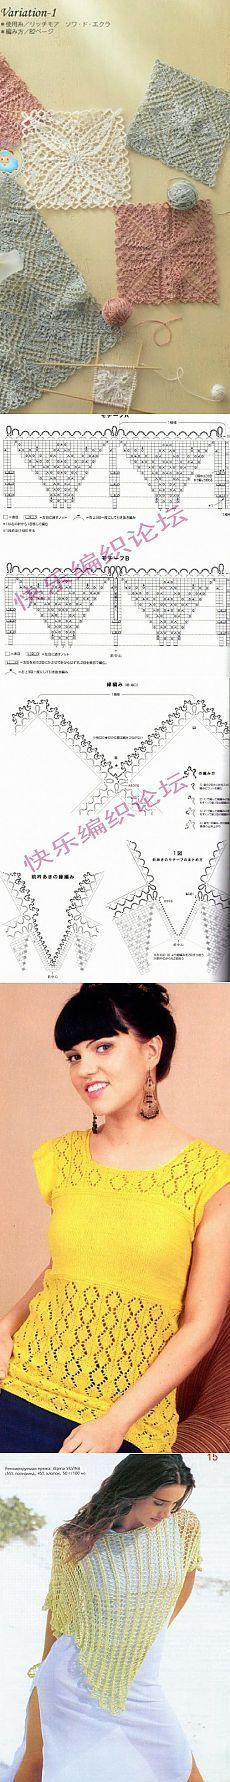 The scheme of knitting needles tunics